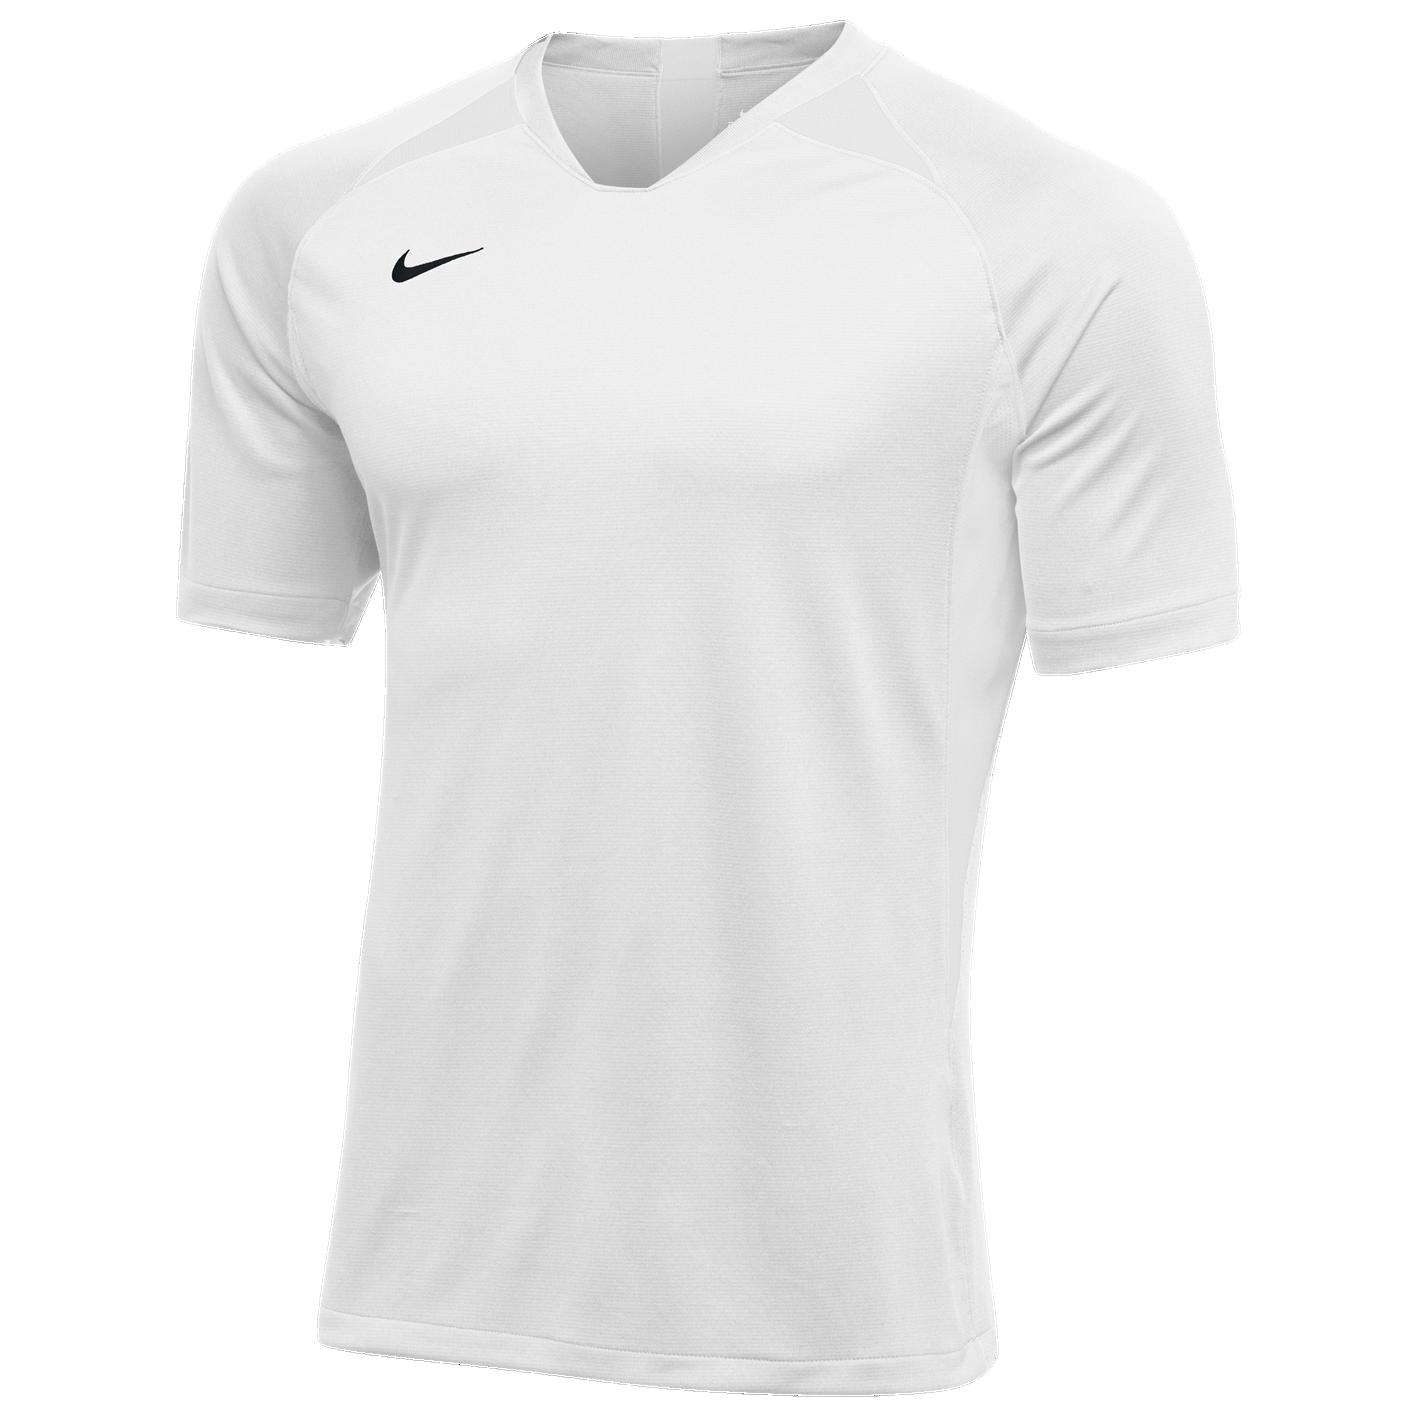 89dfa73531723 Nike Team Legend Jersey - Men's - Soccer - Clothing - White/Black